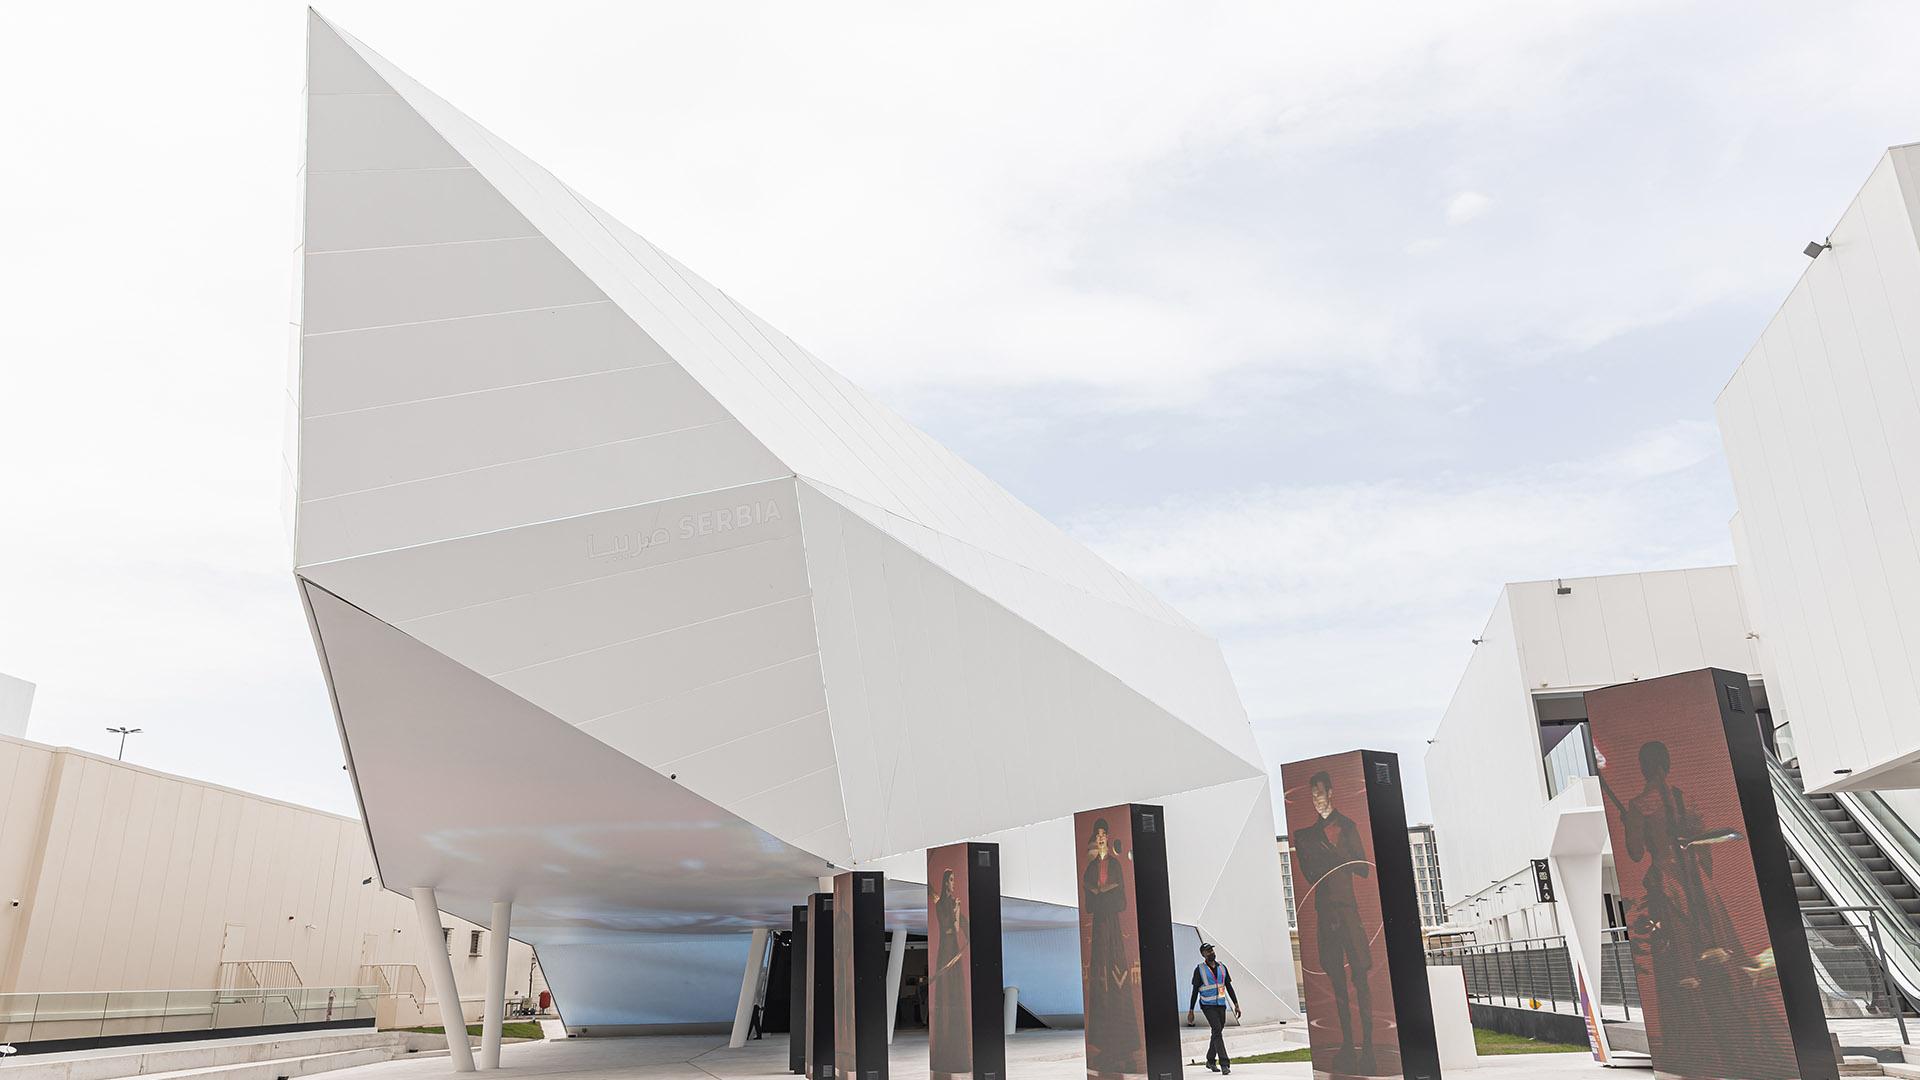 Pavilion of the Republic of Serbia at Expo 2020 Dubai